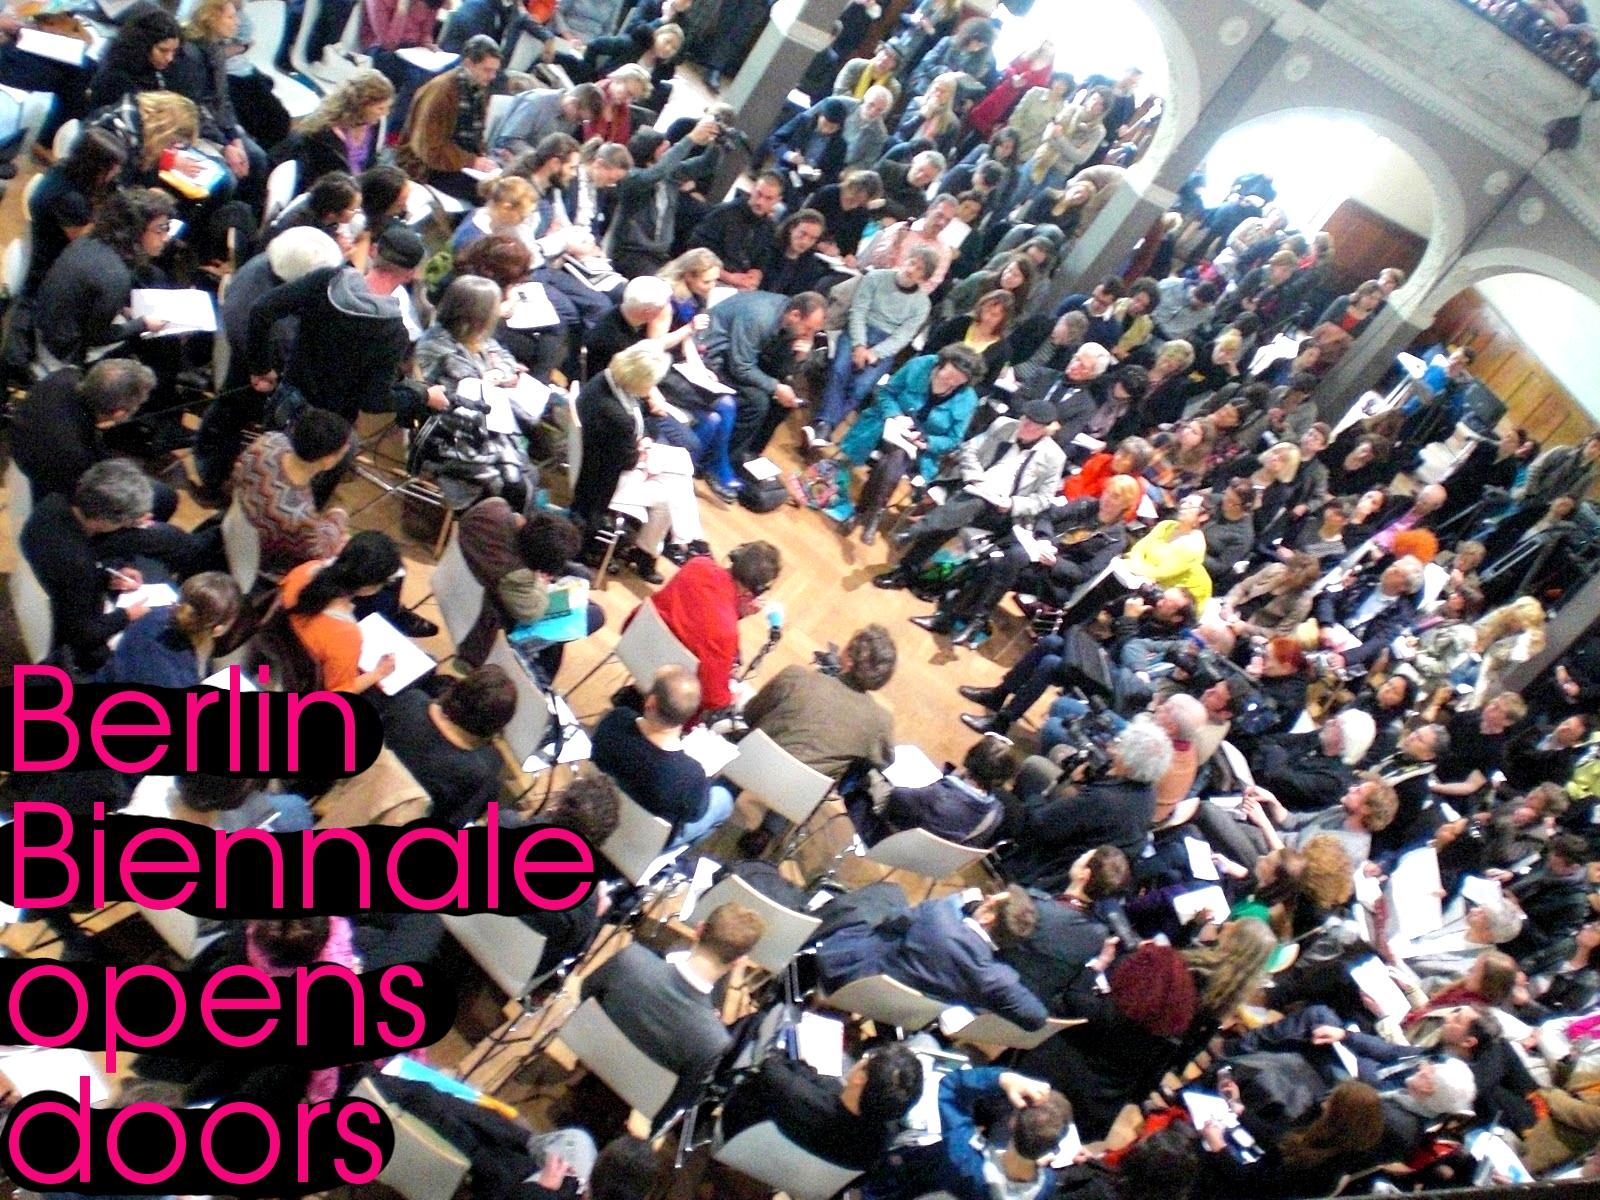 Berlin Biennale opens doors, #berlinsquare never closed